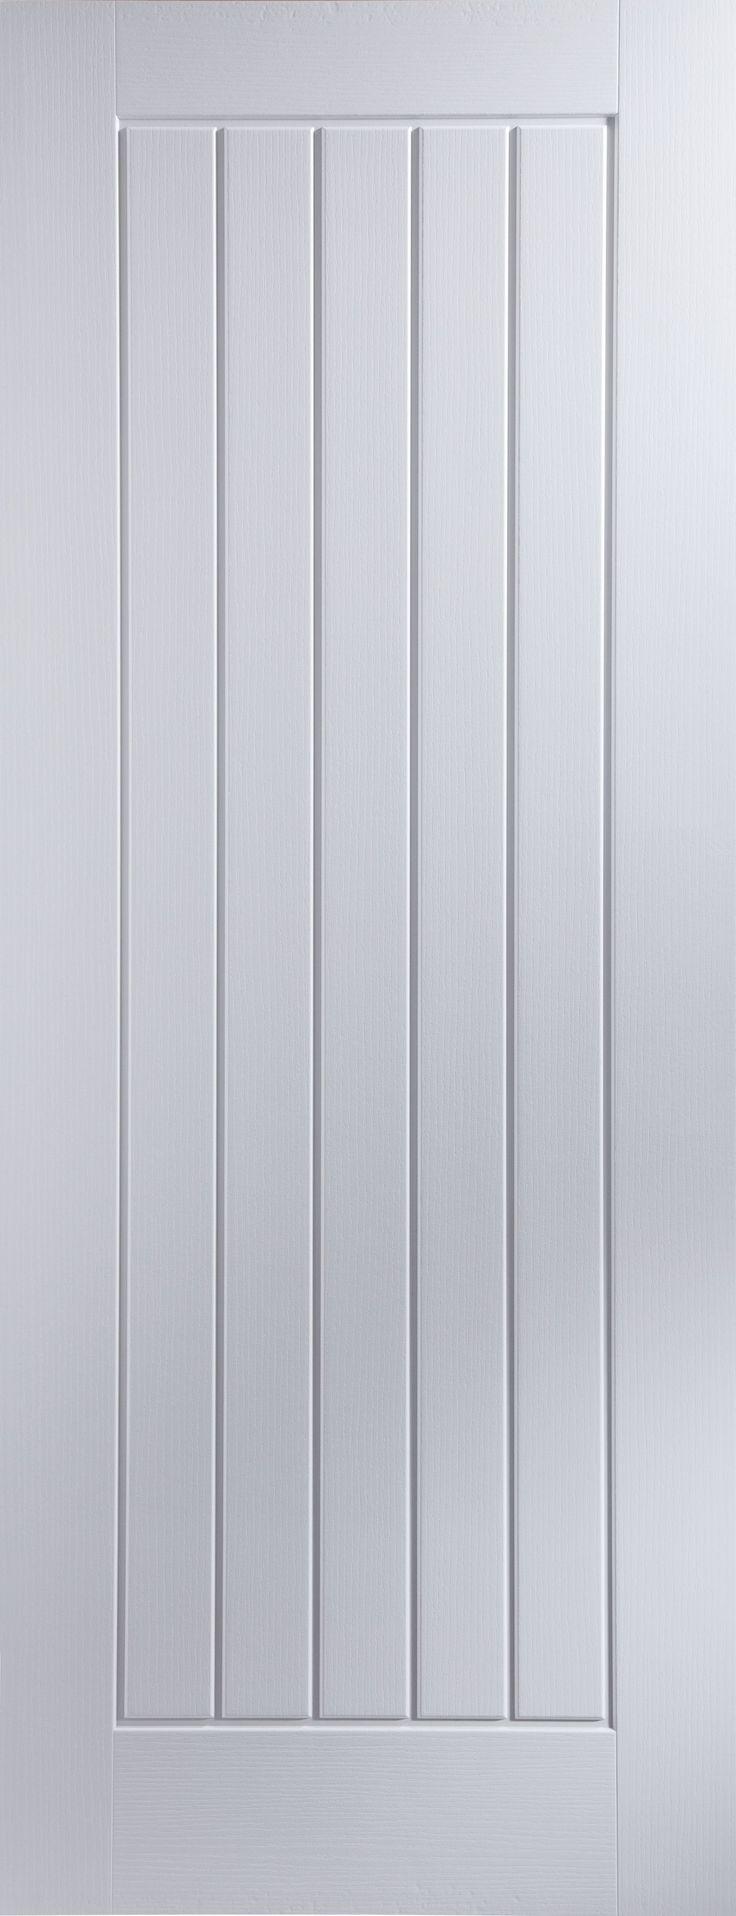 B q bathroom scales - Cottage Panelled Primed Woodgrain Internal Unglazed Door H 1981mm W 686mm